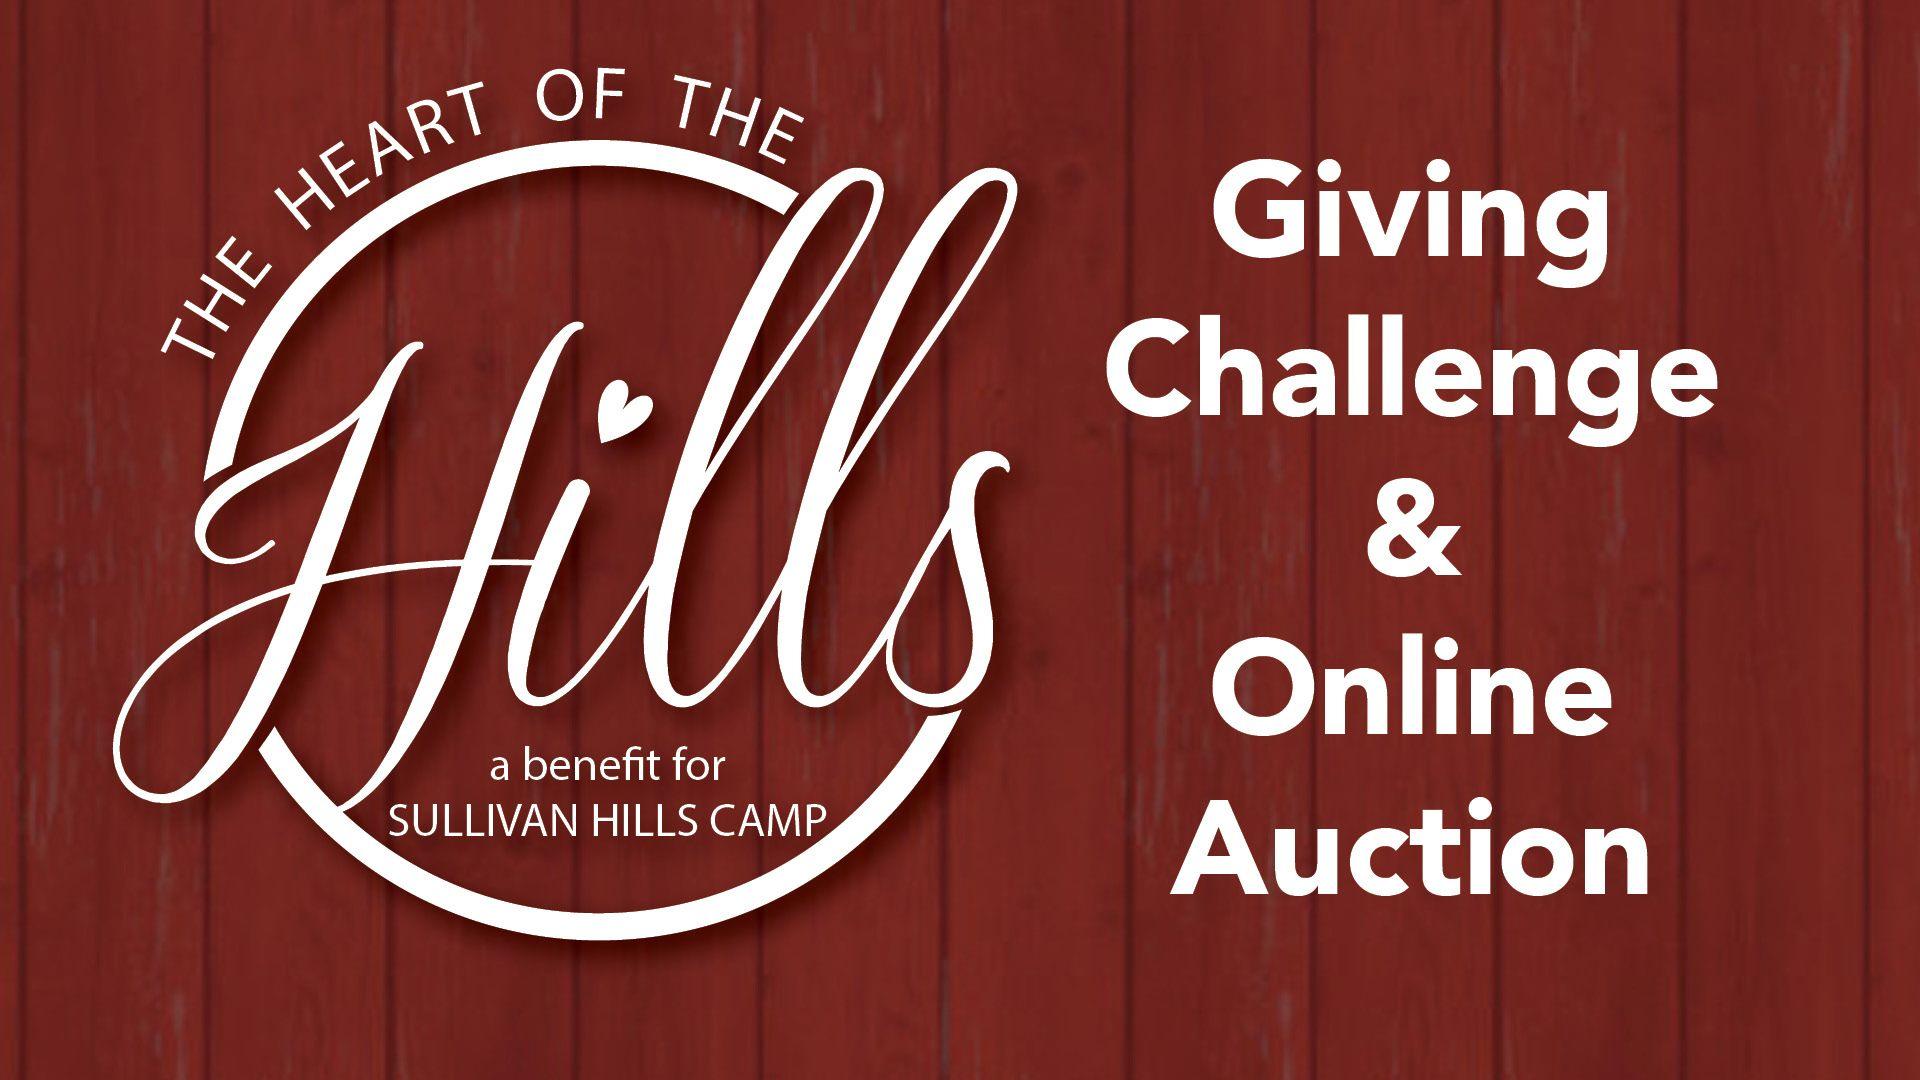 Heart of Hills Online Auction